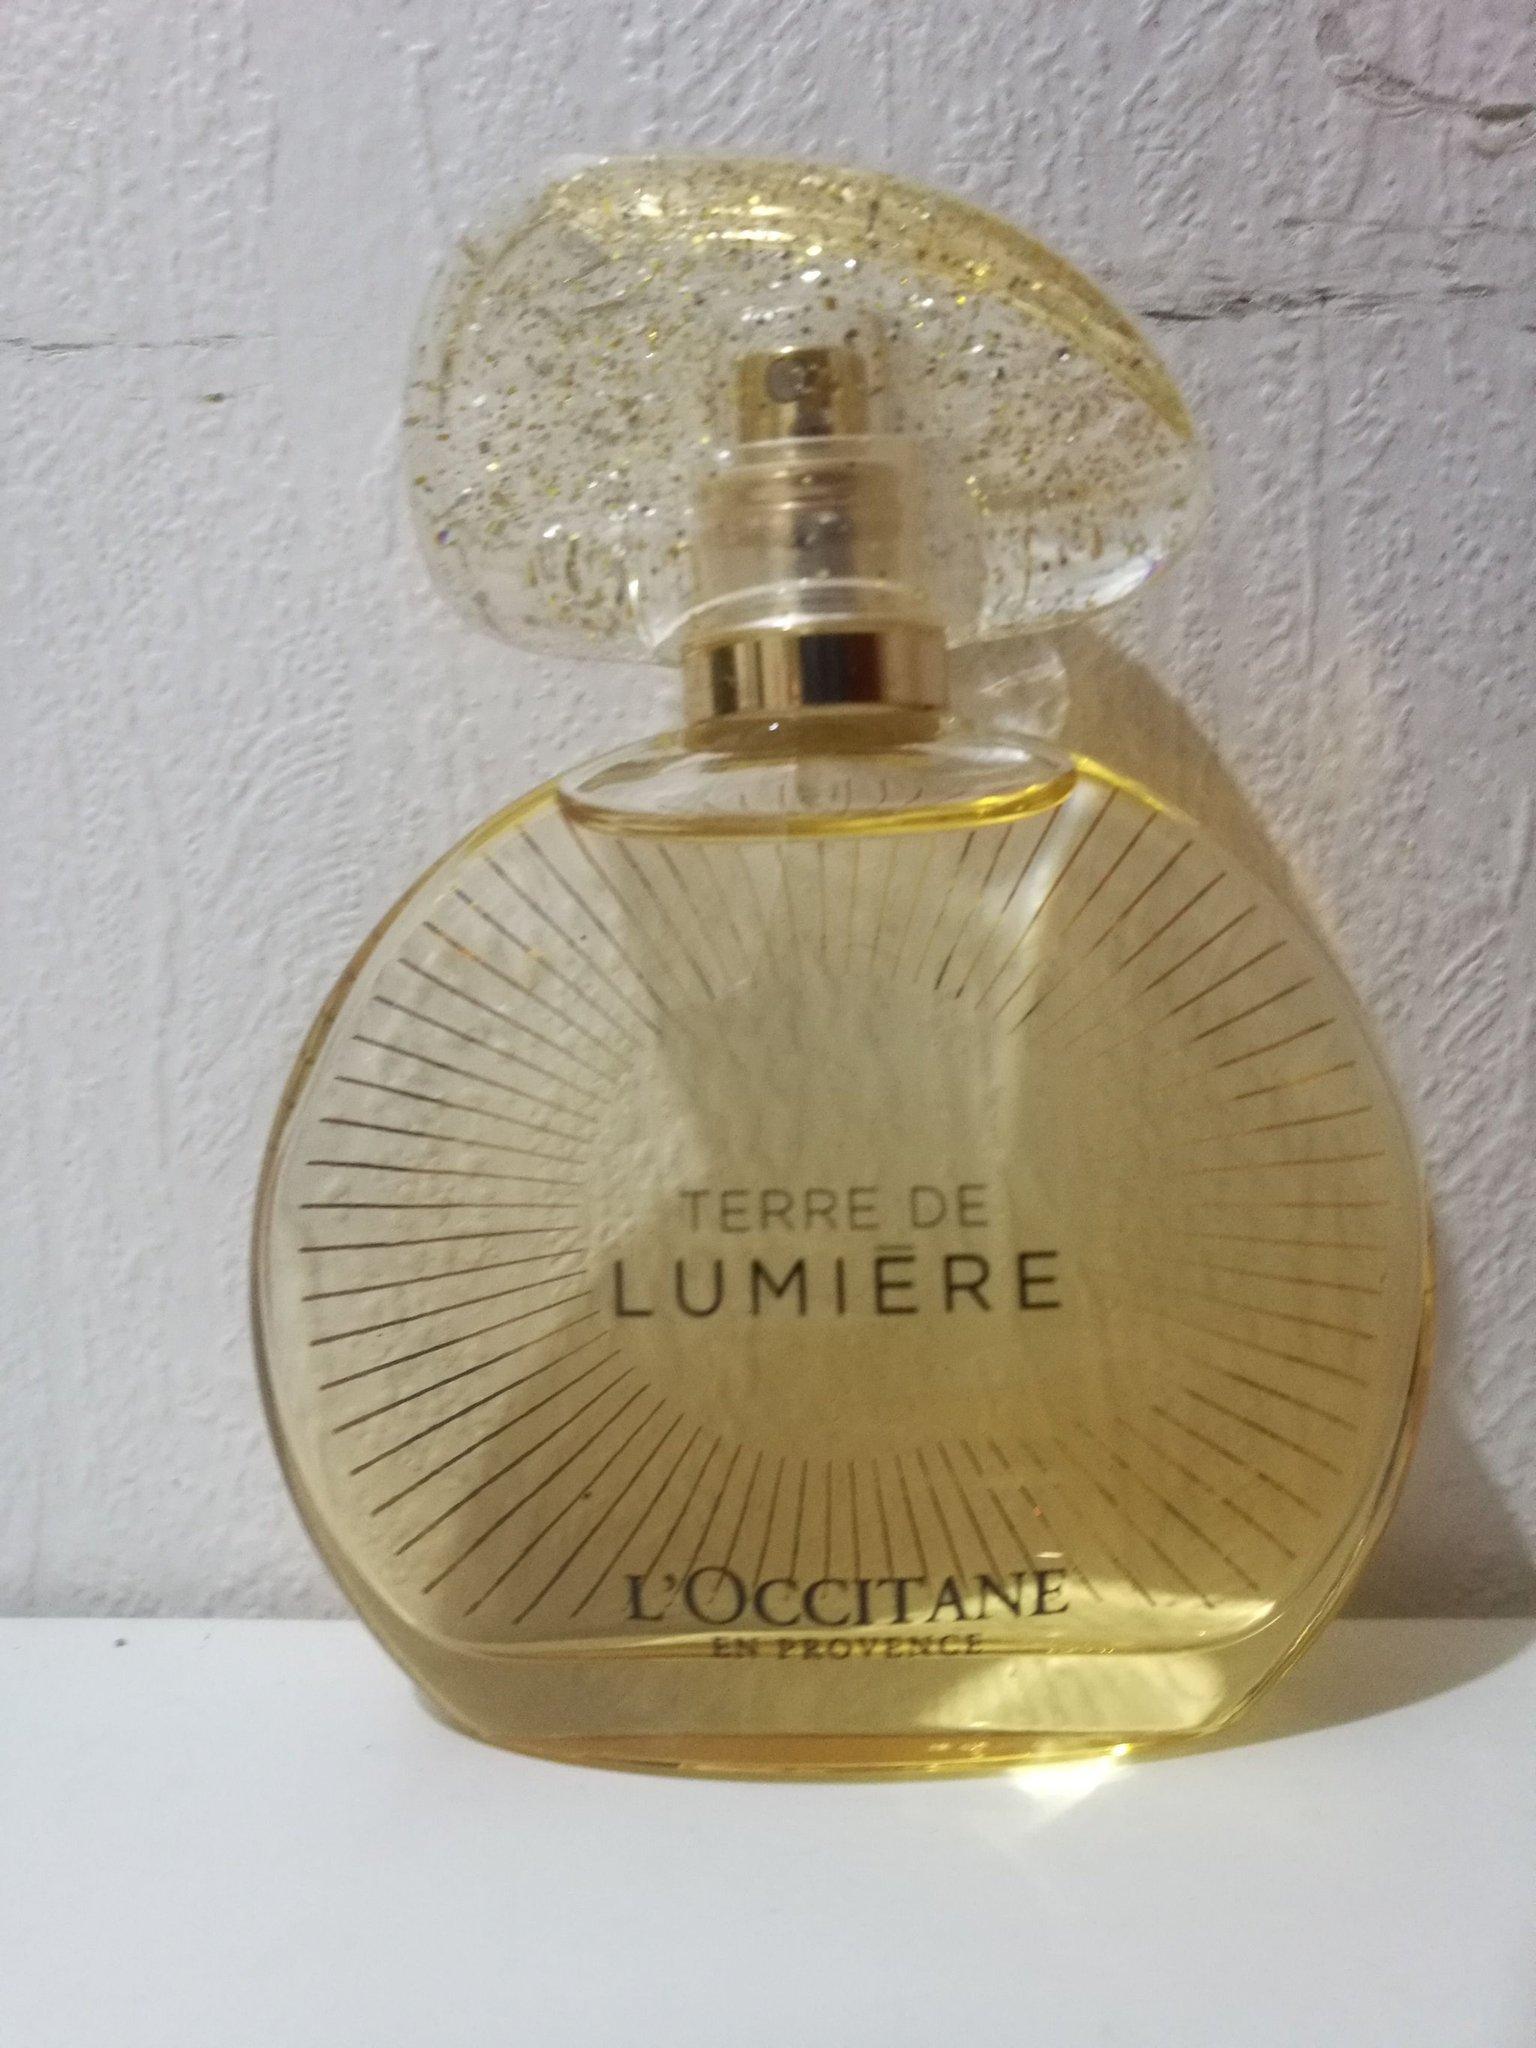 L'Occitane Terre de Lumière Gold Edition 50 ml